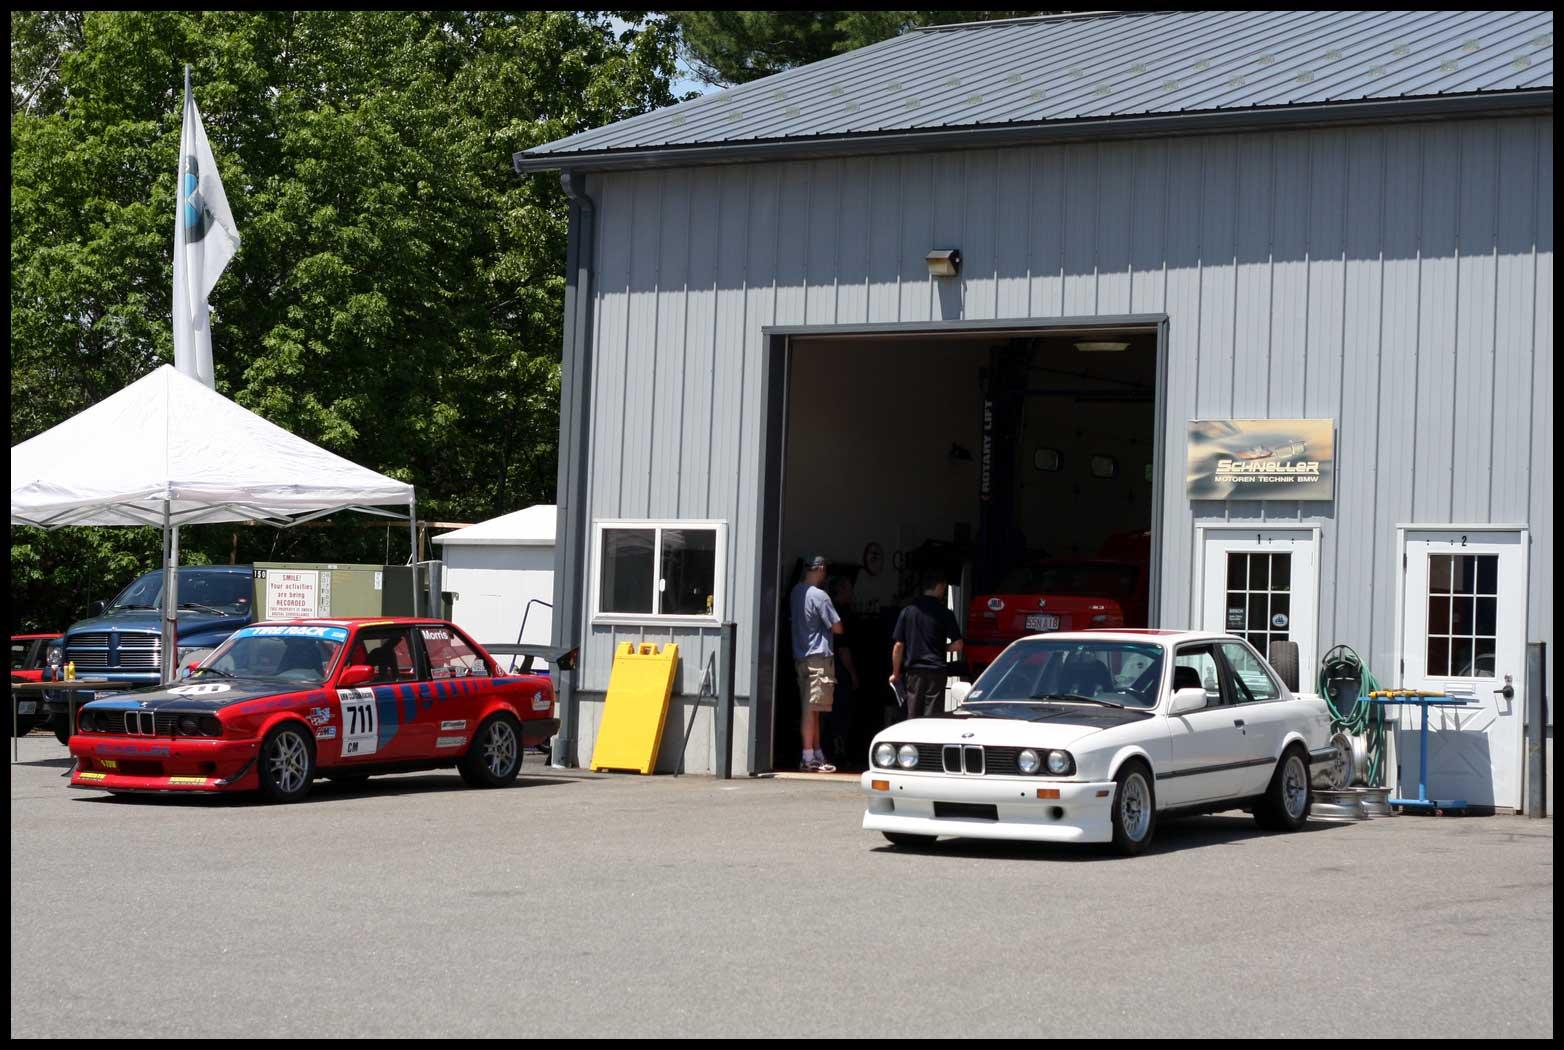 Schneller-BMW-MINI-service-repair-Shop